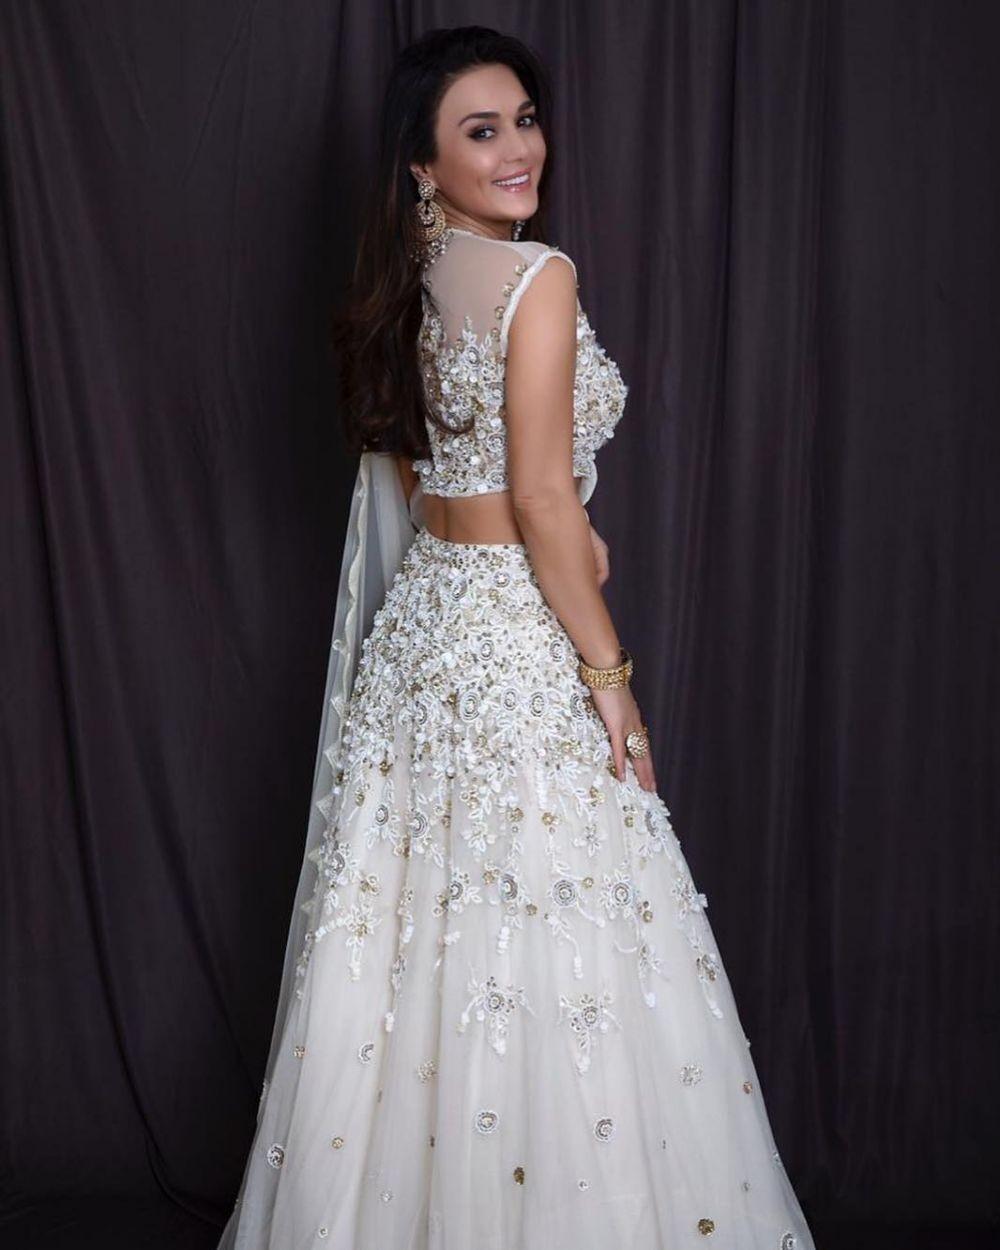 Kasual Sampai Anggun, 8 Referensi Fashion Stylish ala Preity Zinta